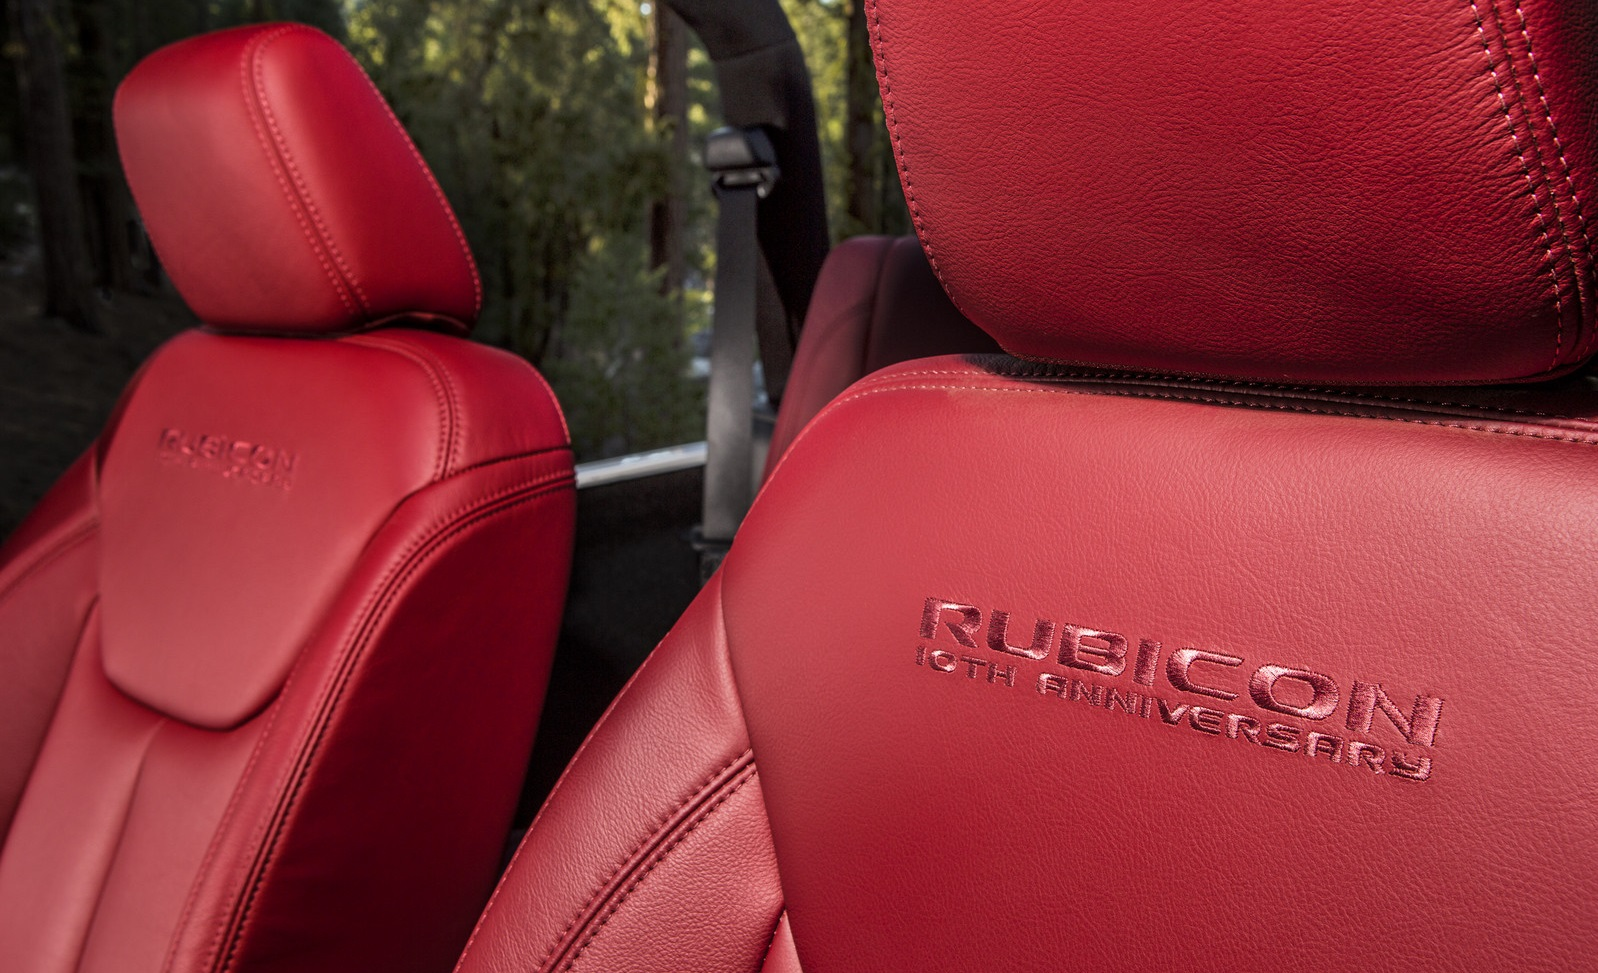 jeep aftermarket seats